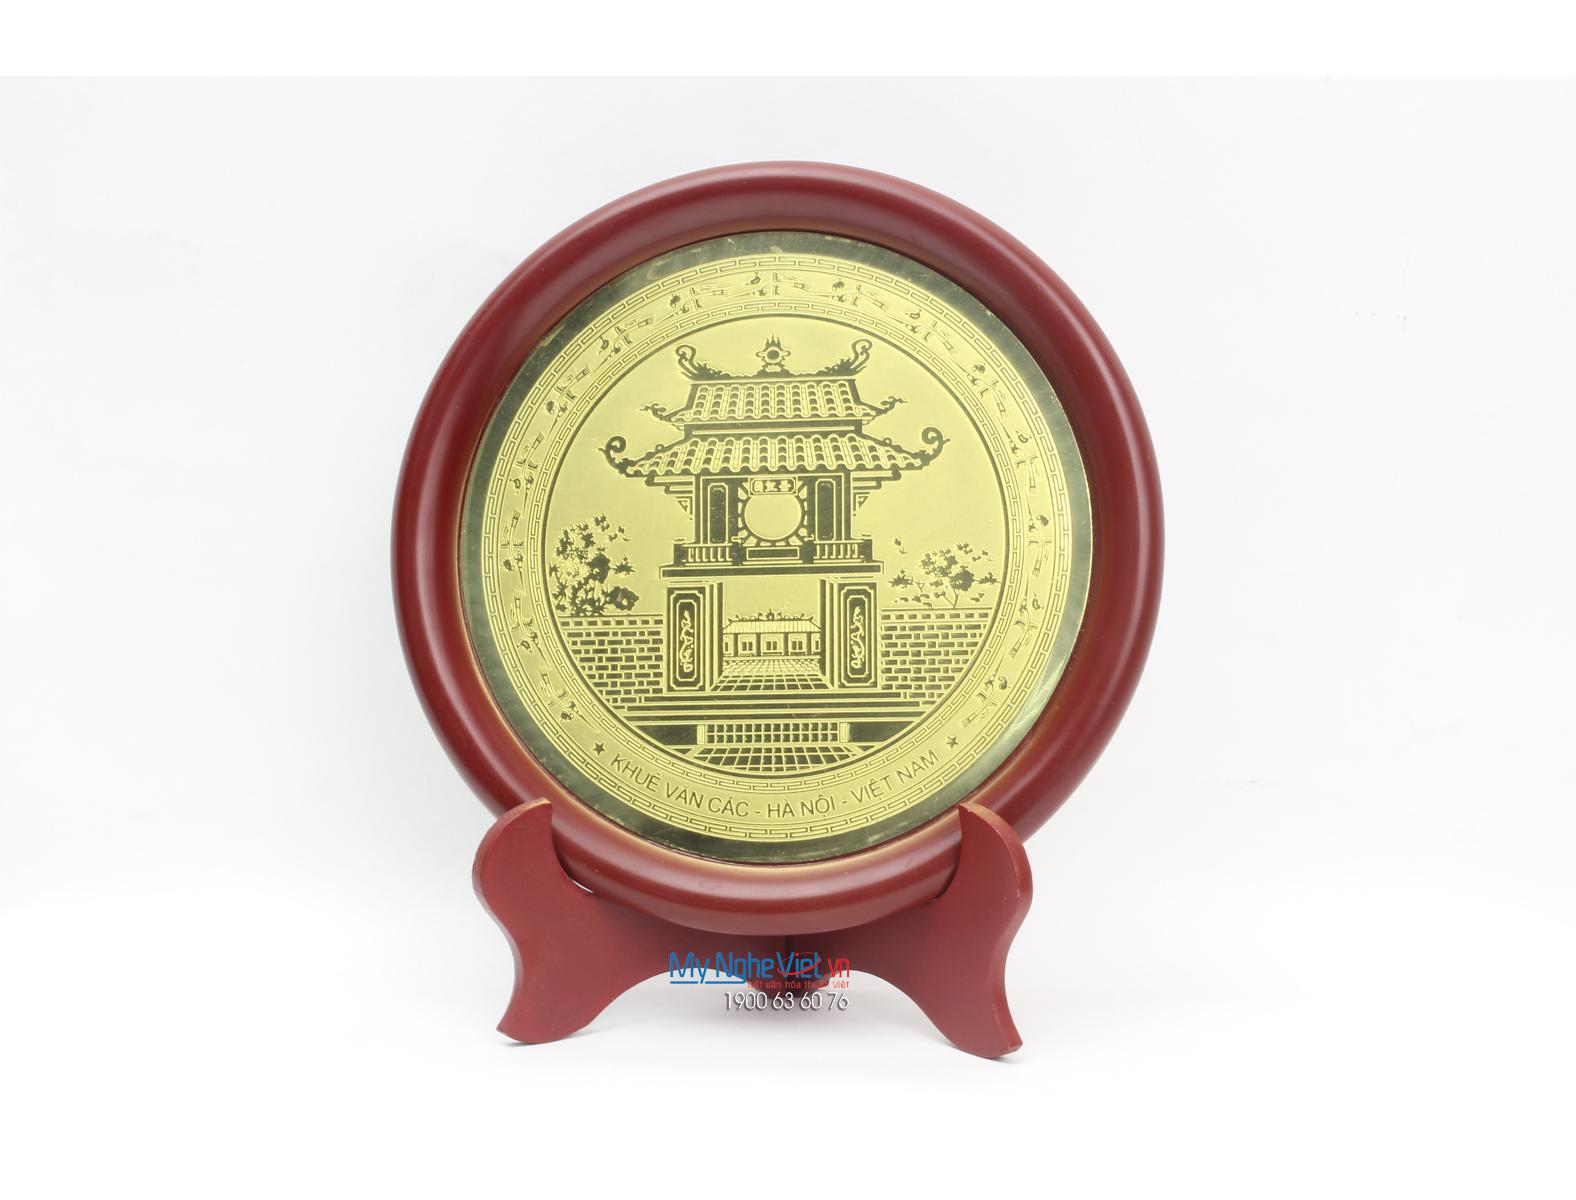 Đĩa đồng lưu niệm MNV-DD03